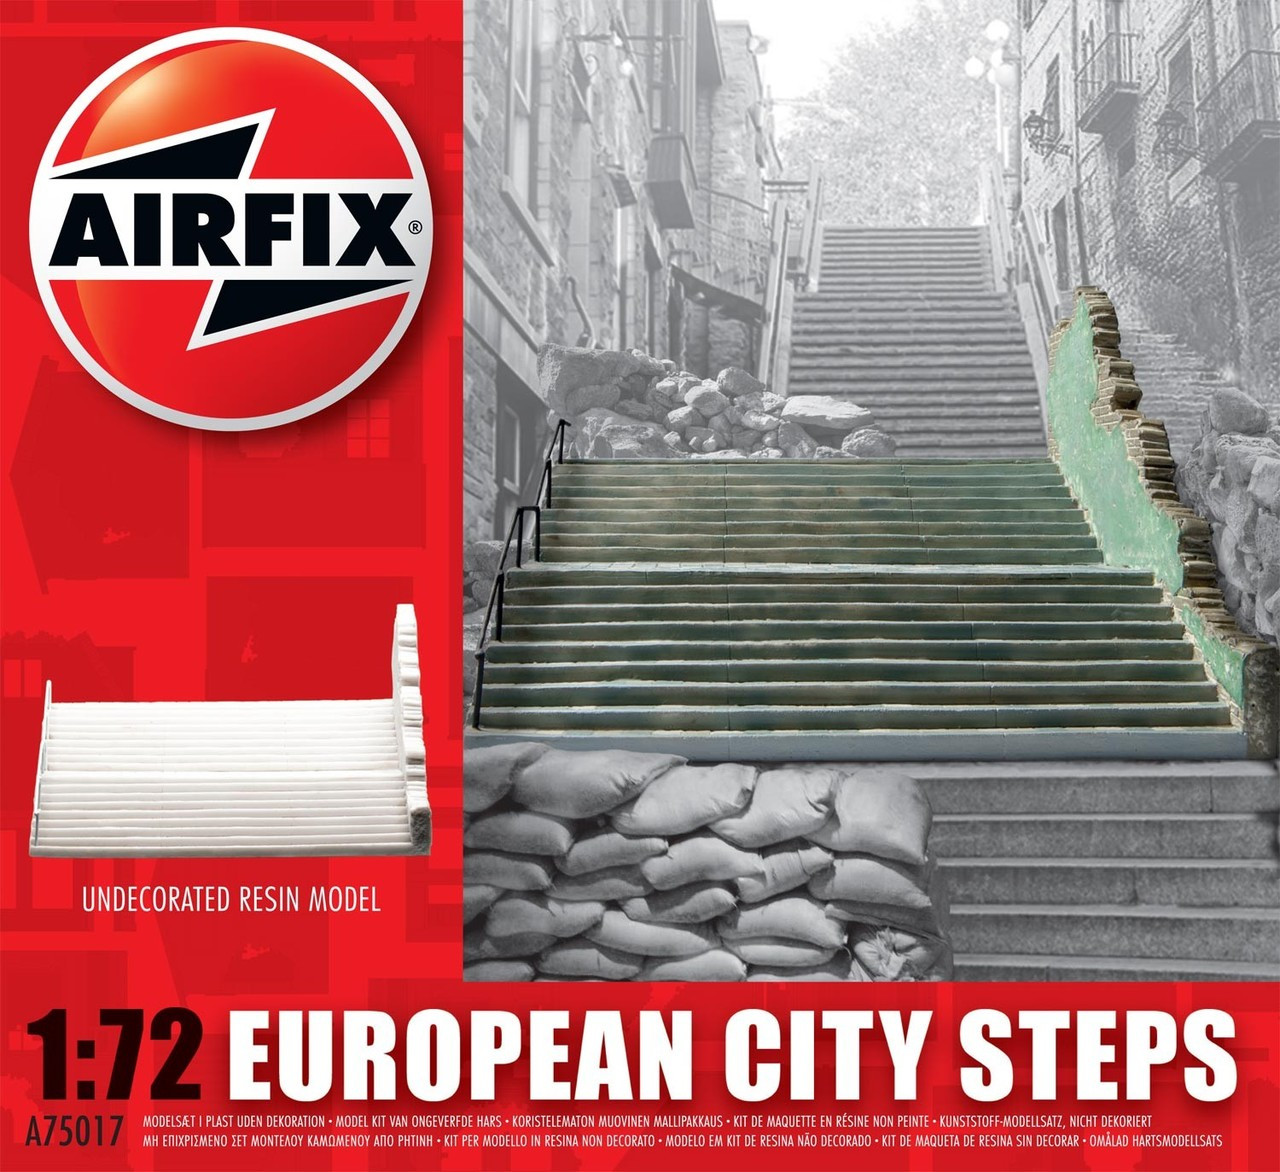 Airfix A75017 European City Steps 1:72 Scale Model Kit